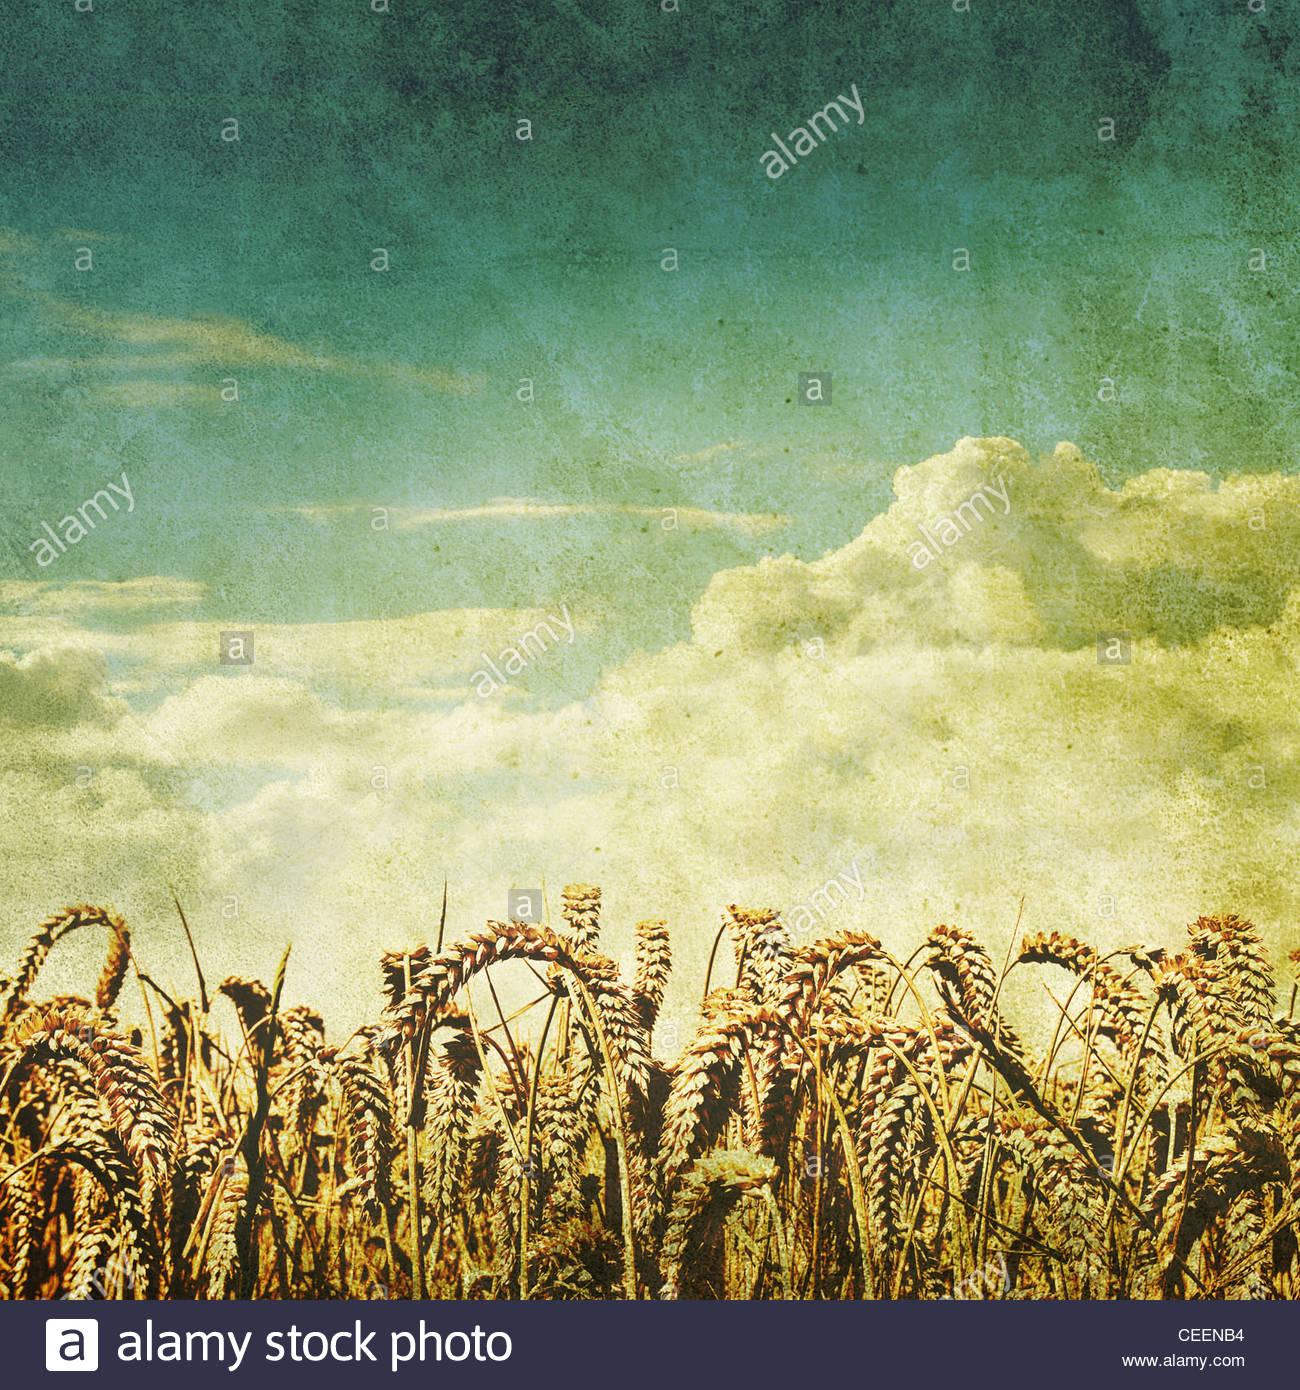 retro wheat field photo - Stock Image